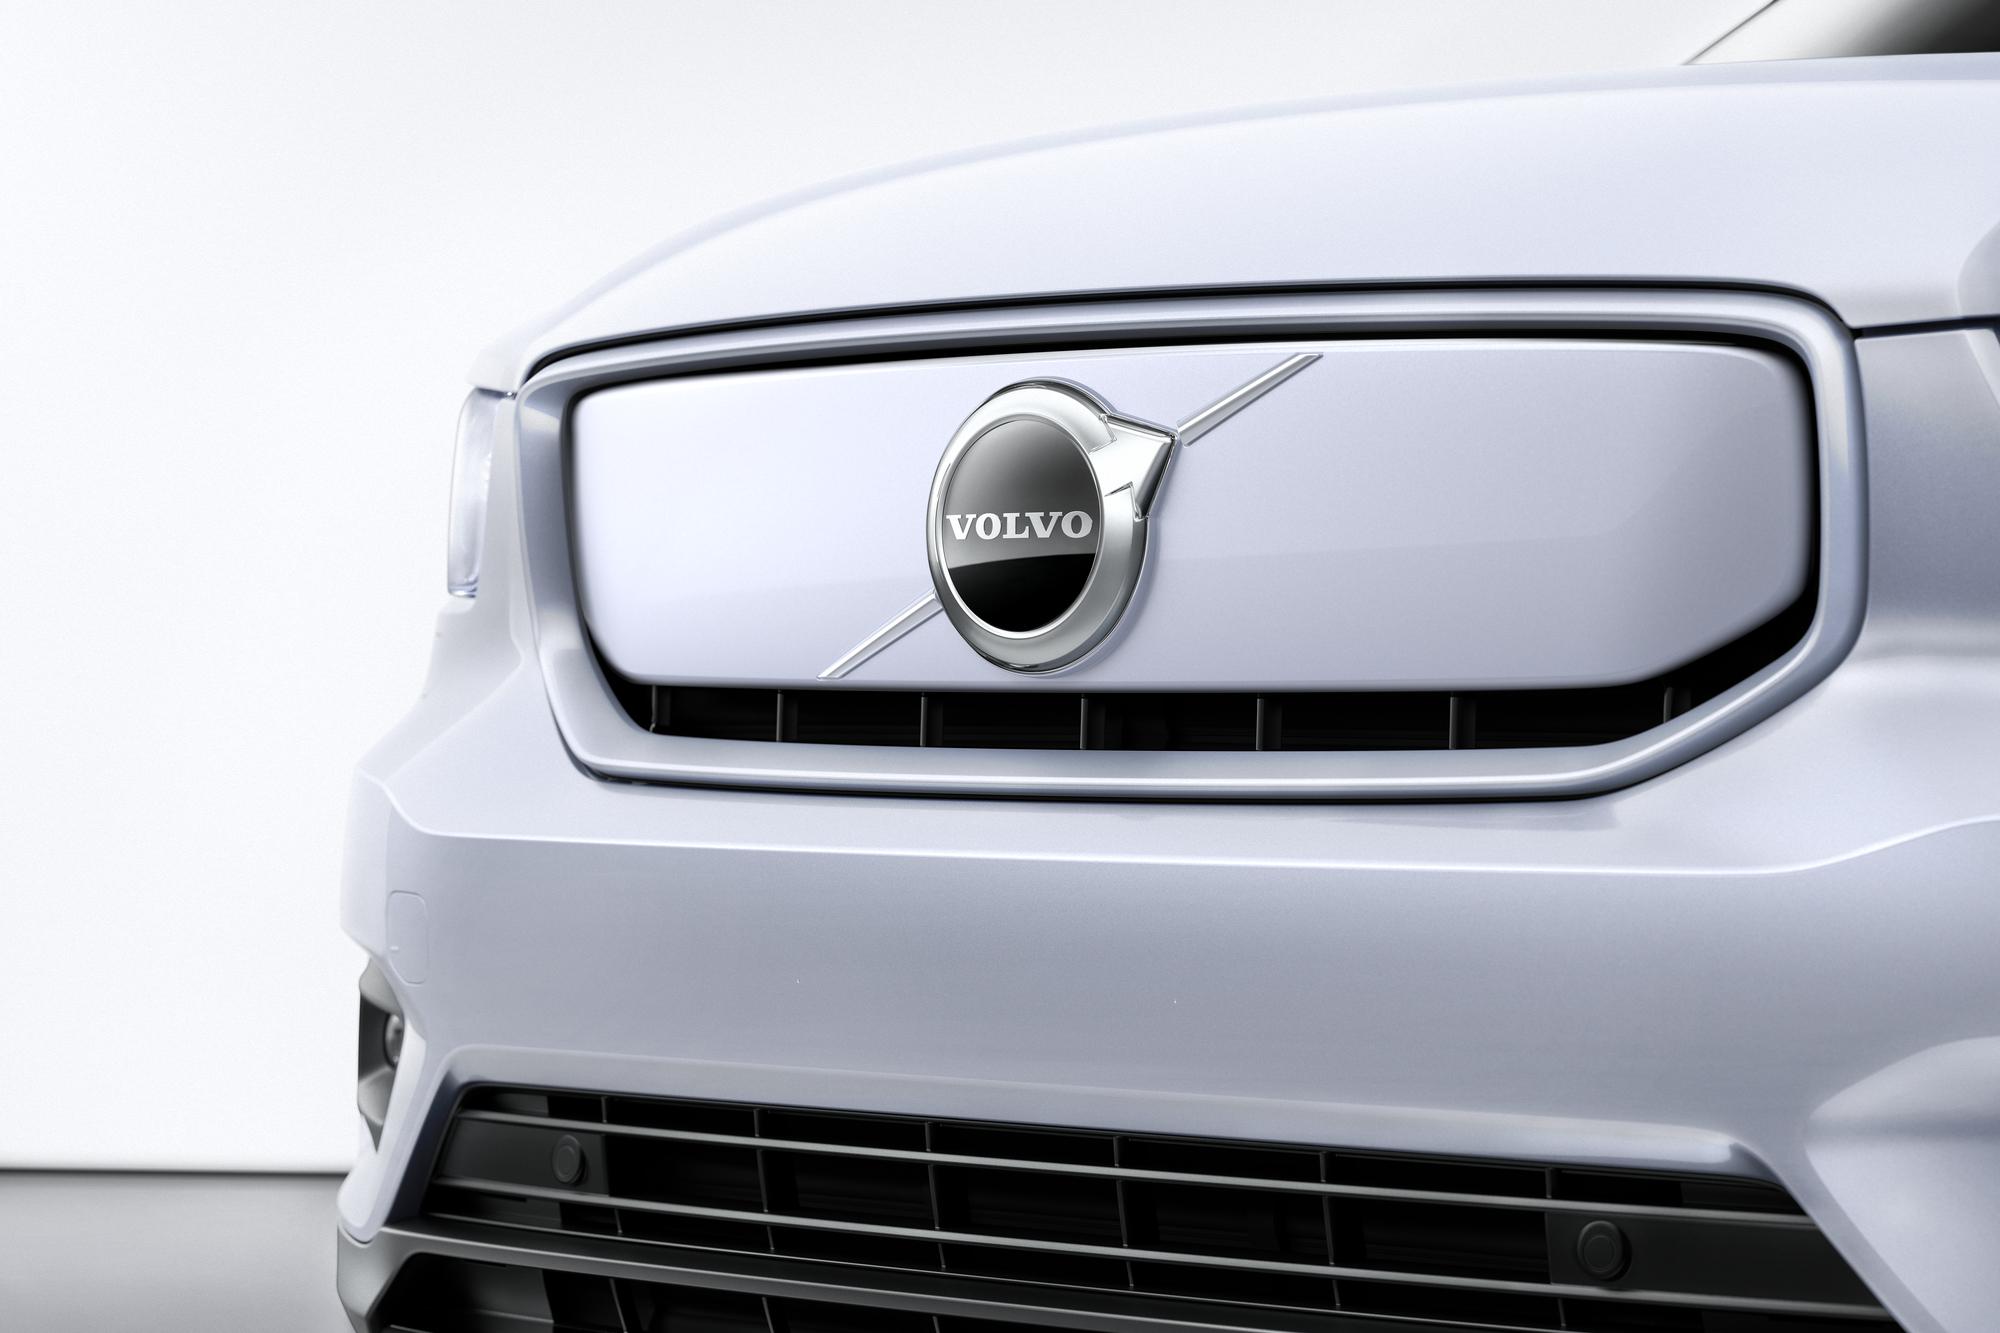 Volvo ХС40 Recharge ru фото экстерьера 3